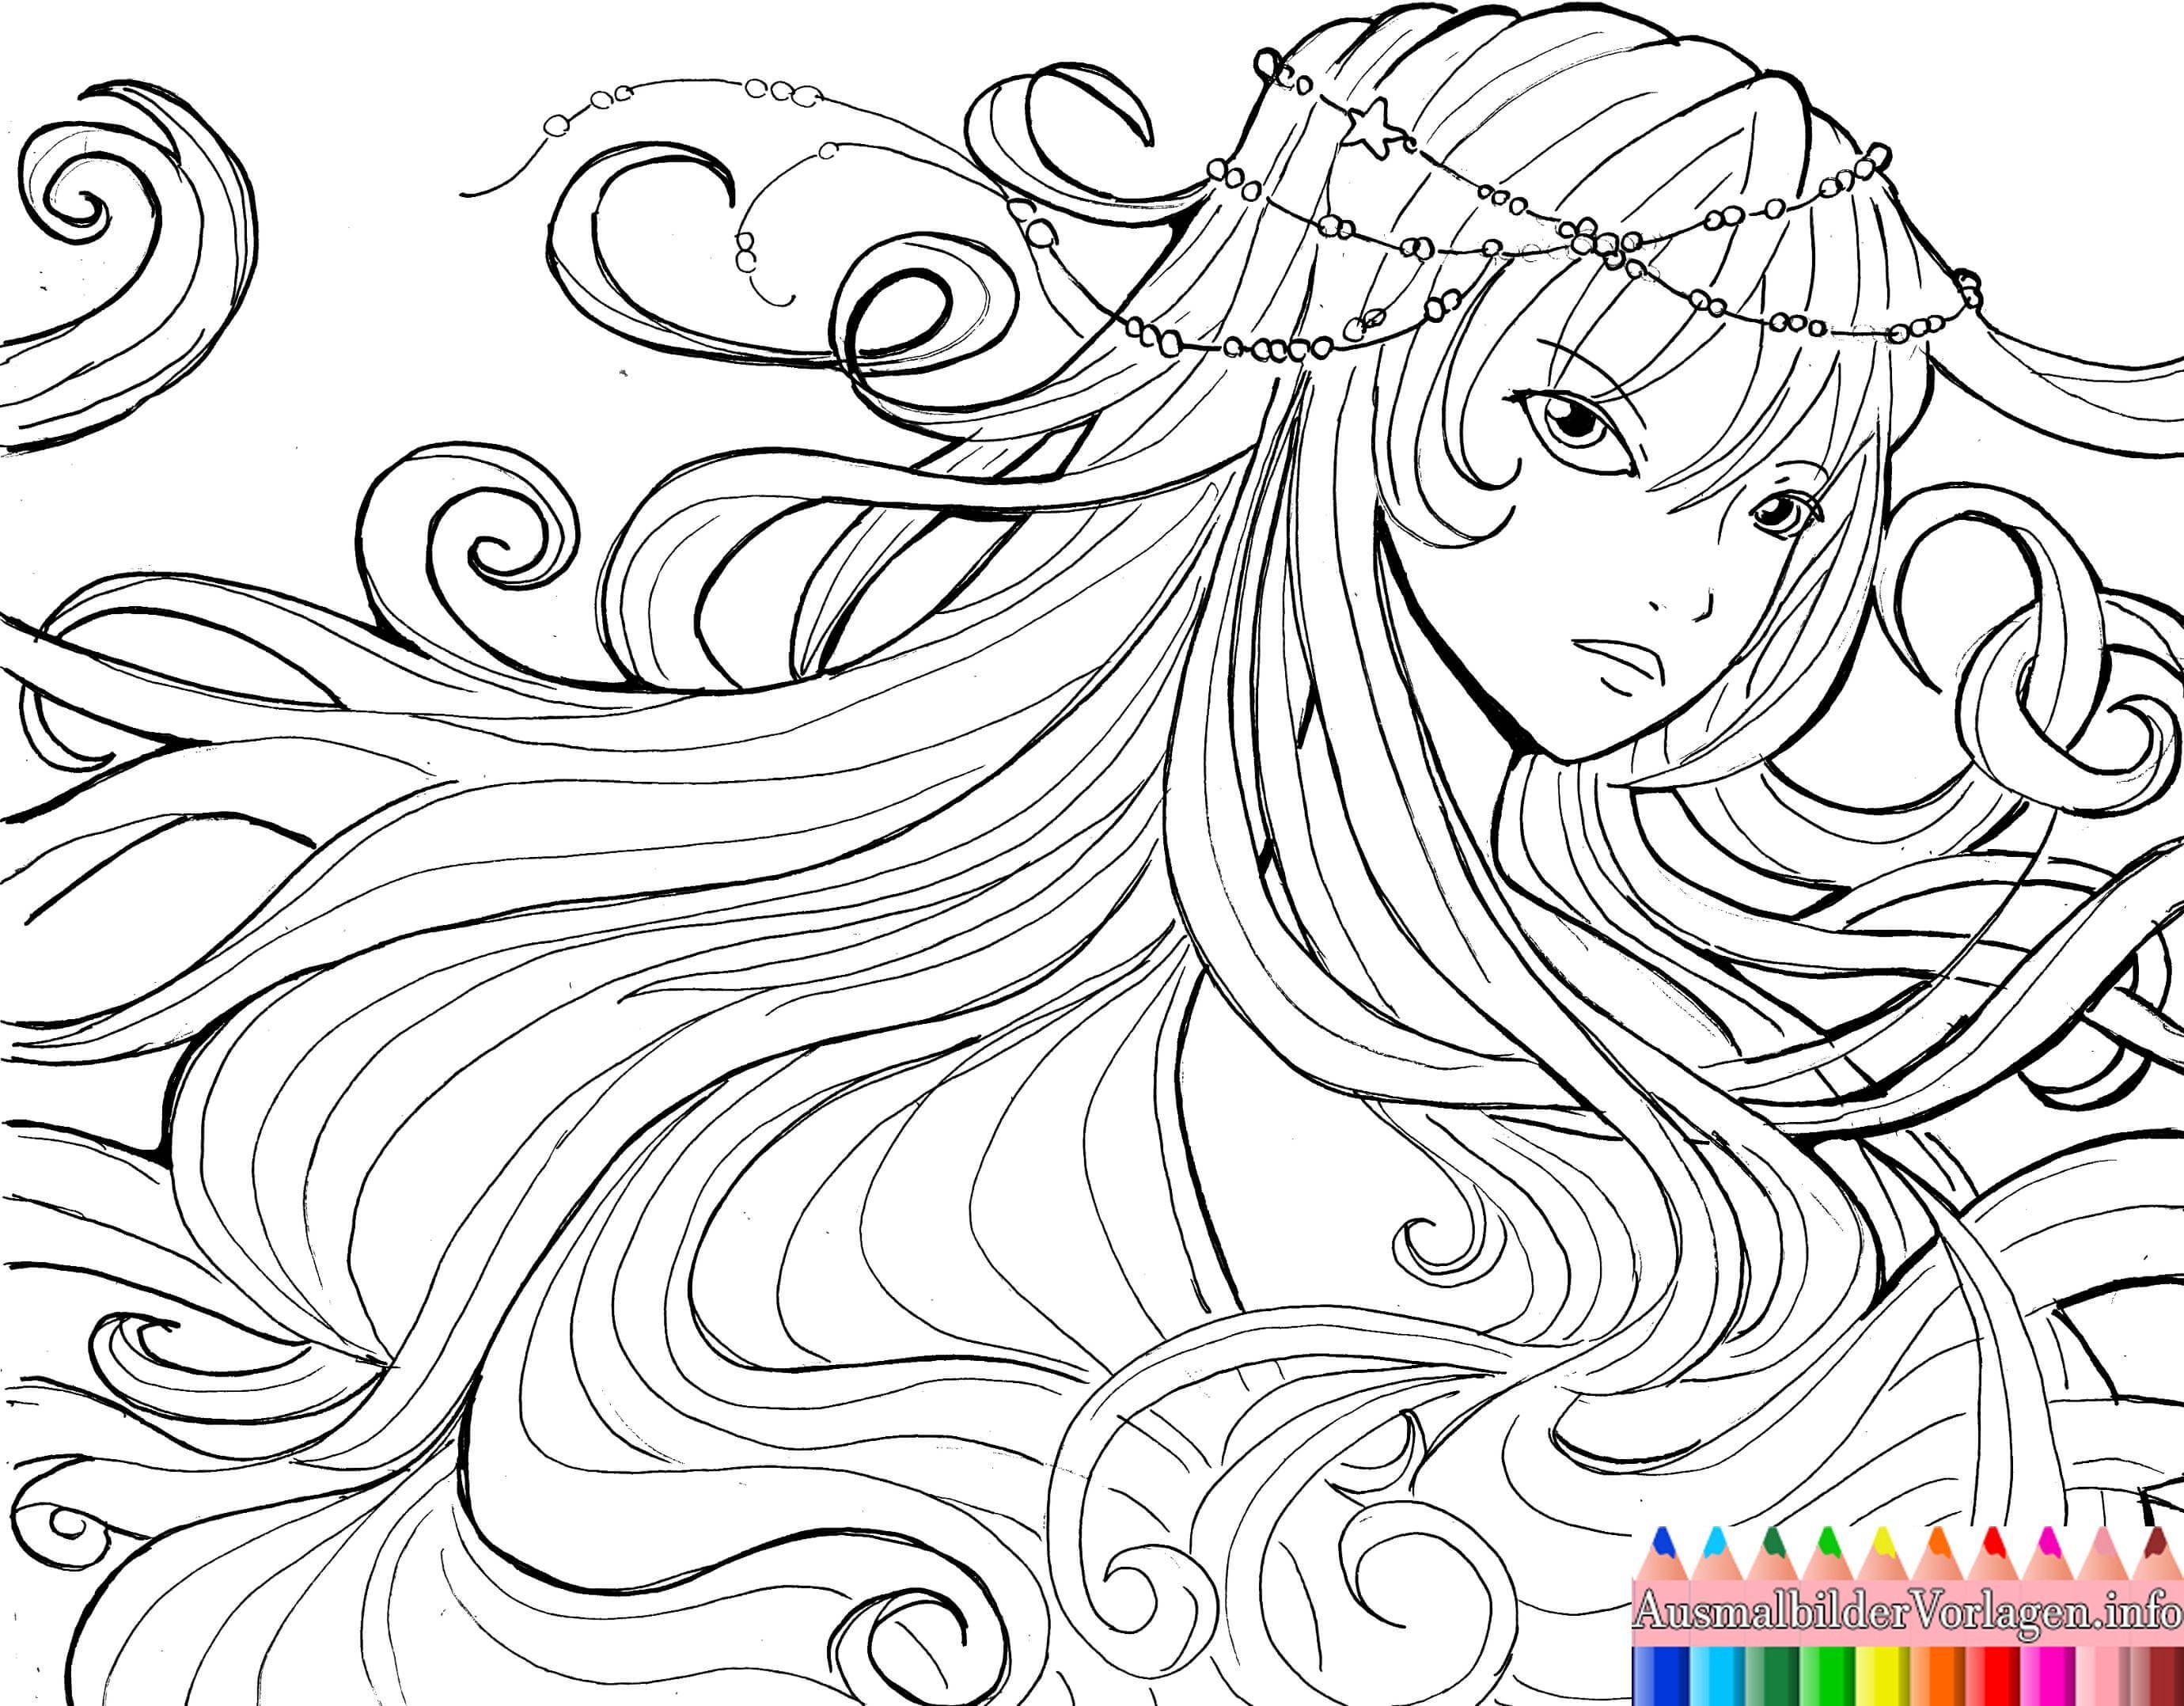 Malvorlagen Anime Engel Coloring and Malvorlagan